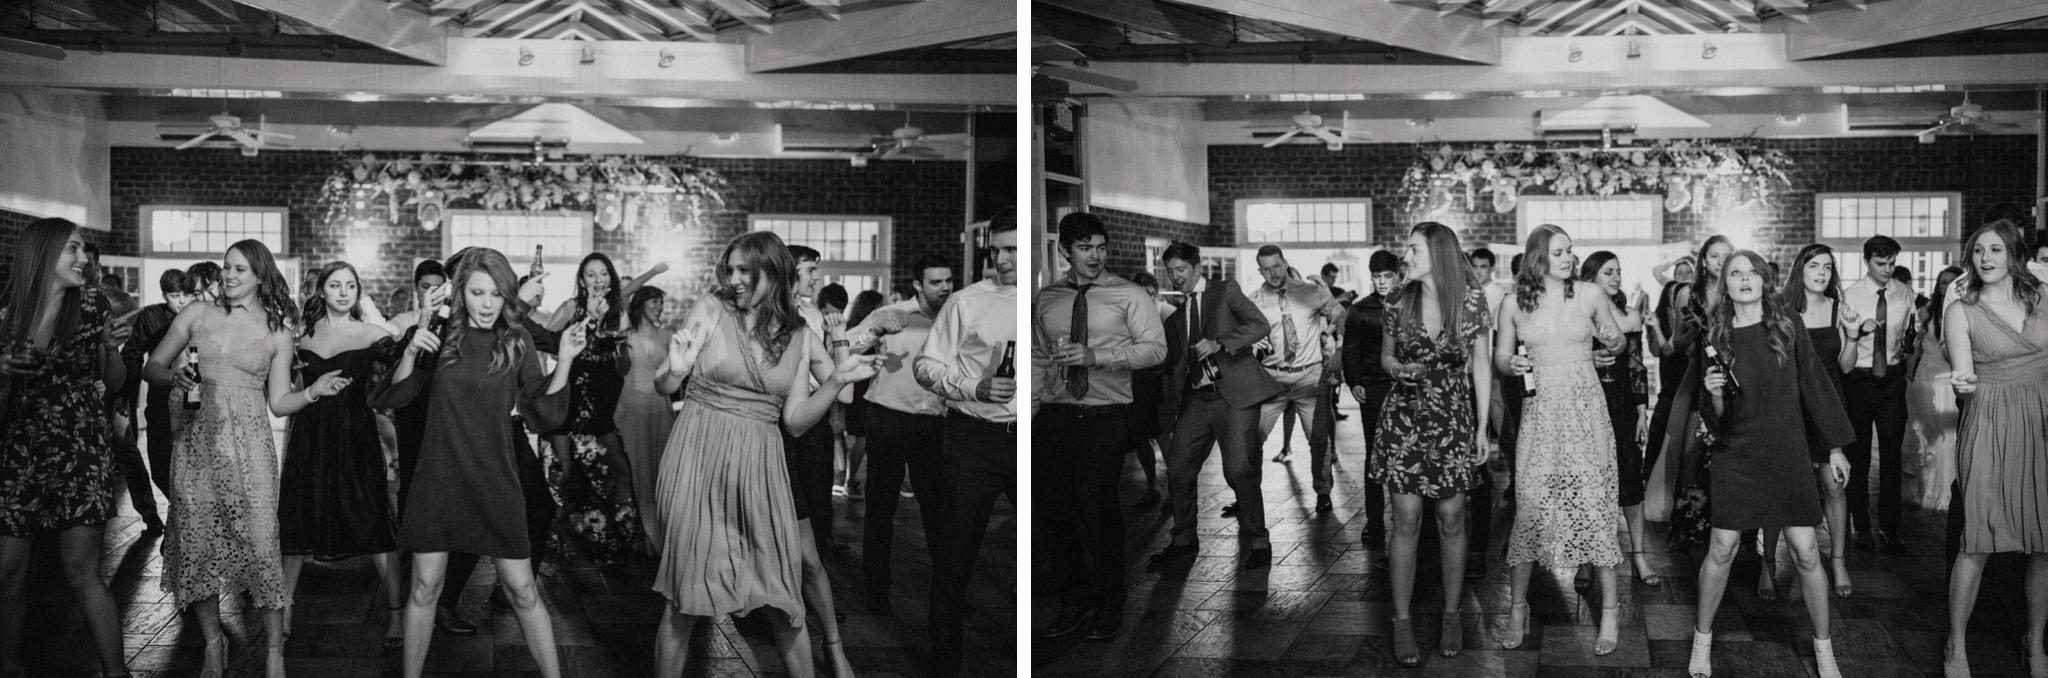 88_West Manor Estate Weddings - Pat Cori Photography-202_West Manor Estate Weddings - Pat Cori Photography-203_Wedding_dancing_VirginiaWeddingPhotographer_WestManorEstate_Weddingvenue_reception.jpg